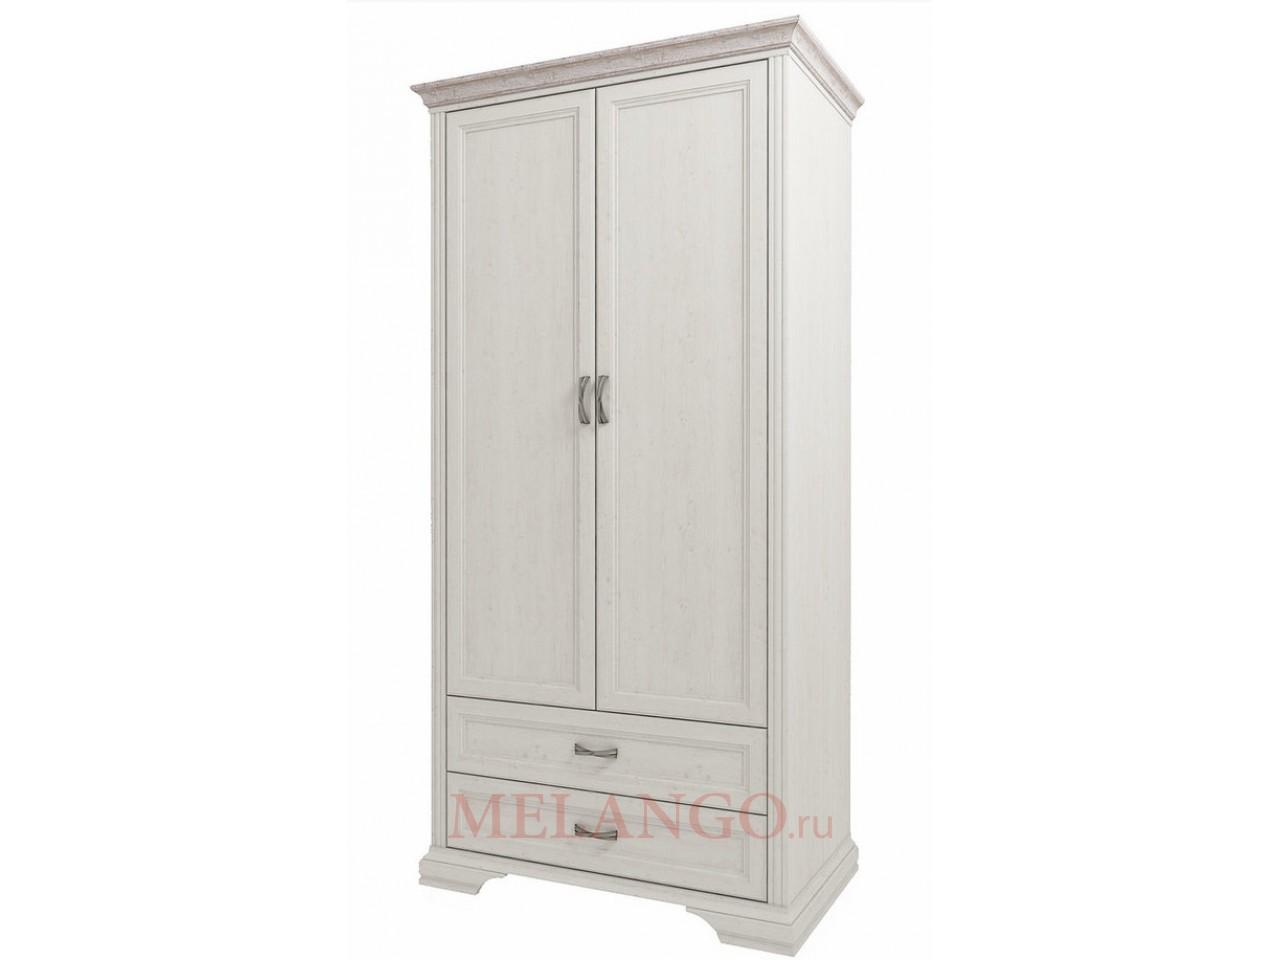 Двухстворчатый шкаф для одежды Монако 2DG2S